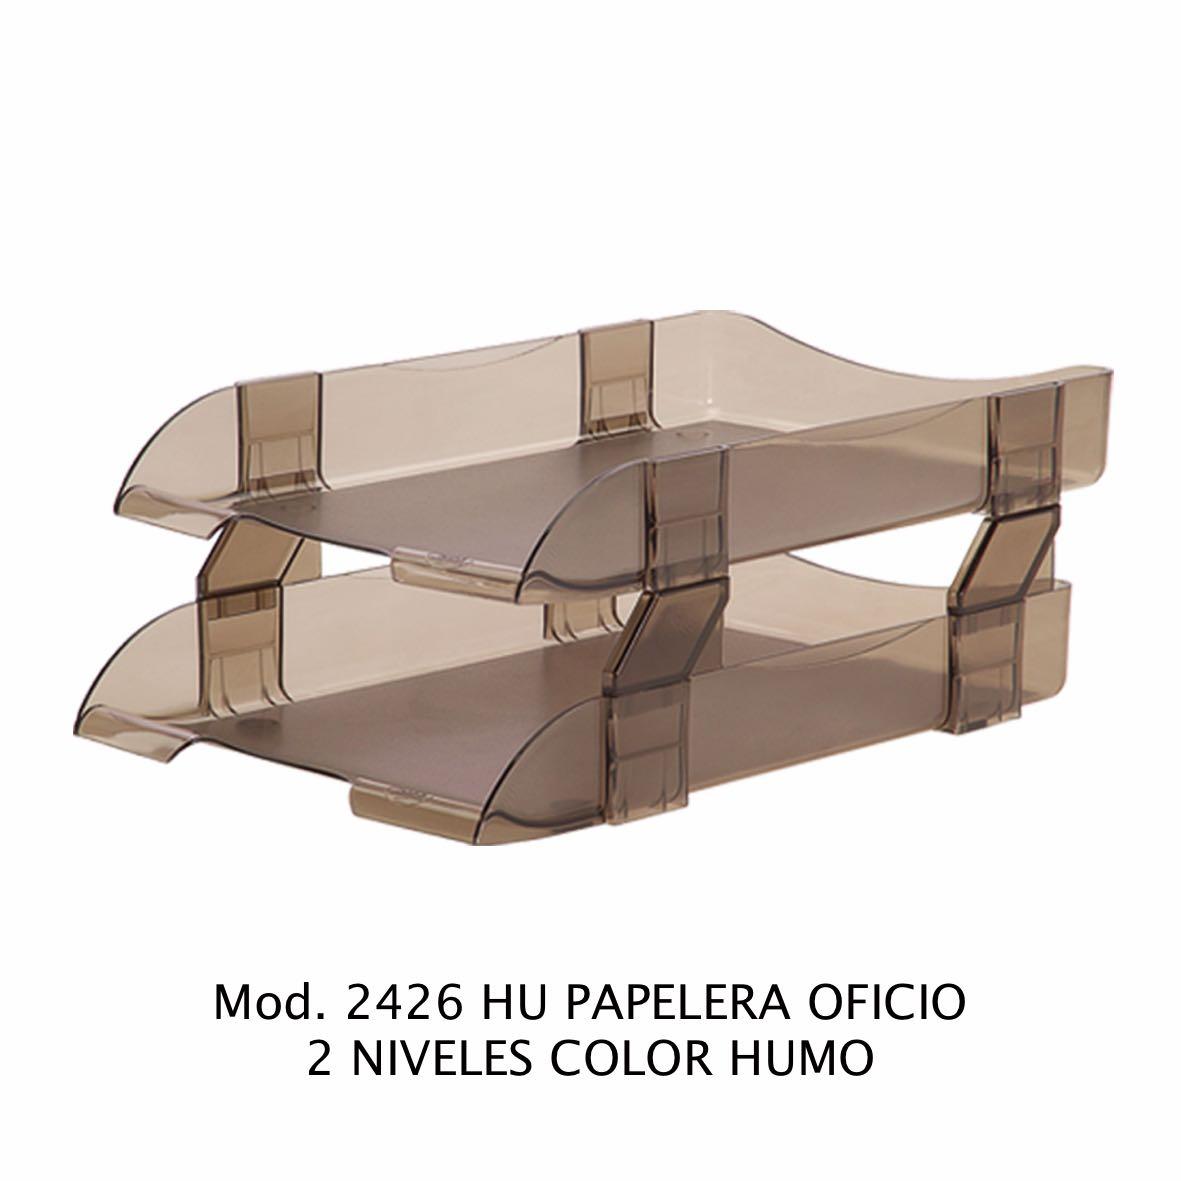 Charola de escritorio tamaño oficio de 2 niveles color humo Modelo 2426 HU - Sablón